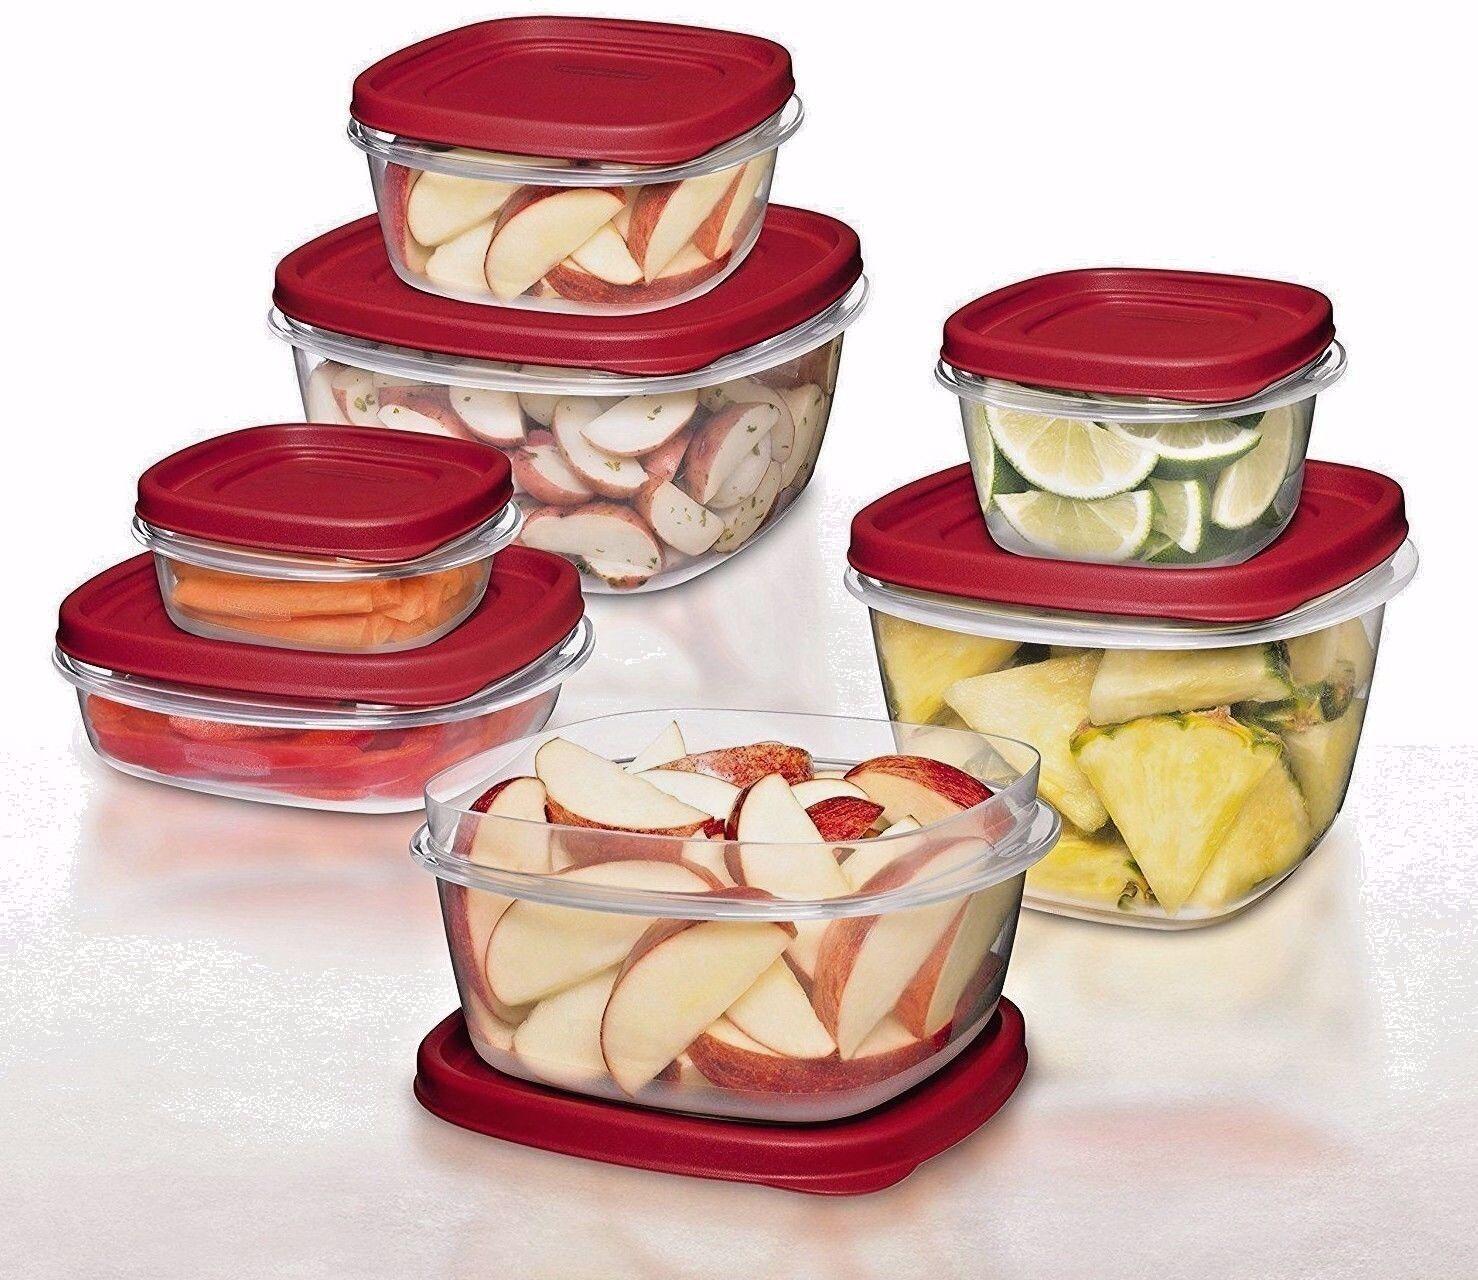 0.5 /1.25 /2 /3/5/7 cups Rubbermaid BPA-FREE Plastic Food St